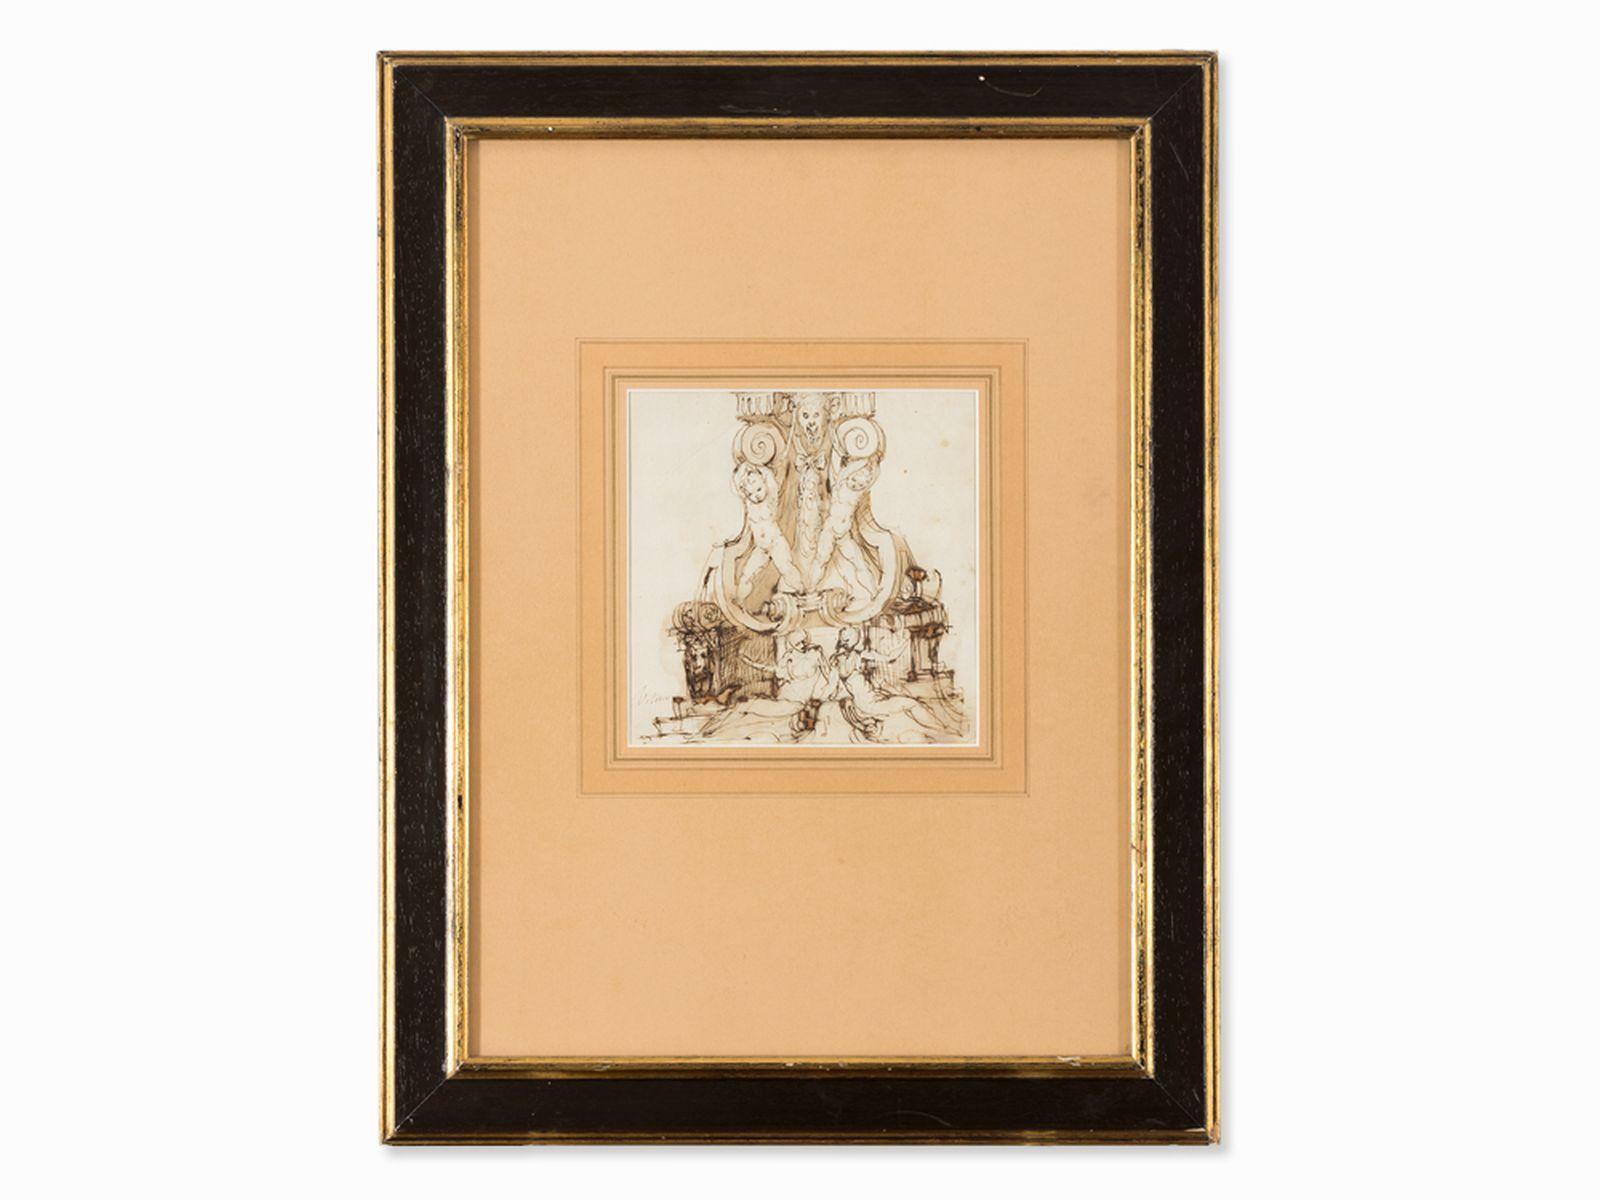 #61 Marco Marchetti (ca.1526-1588), design for a base, 16th century | Marco Marchetti (ca.1526-1588), Entwurf für eine Basis, 16. Jh. Image